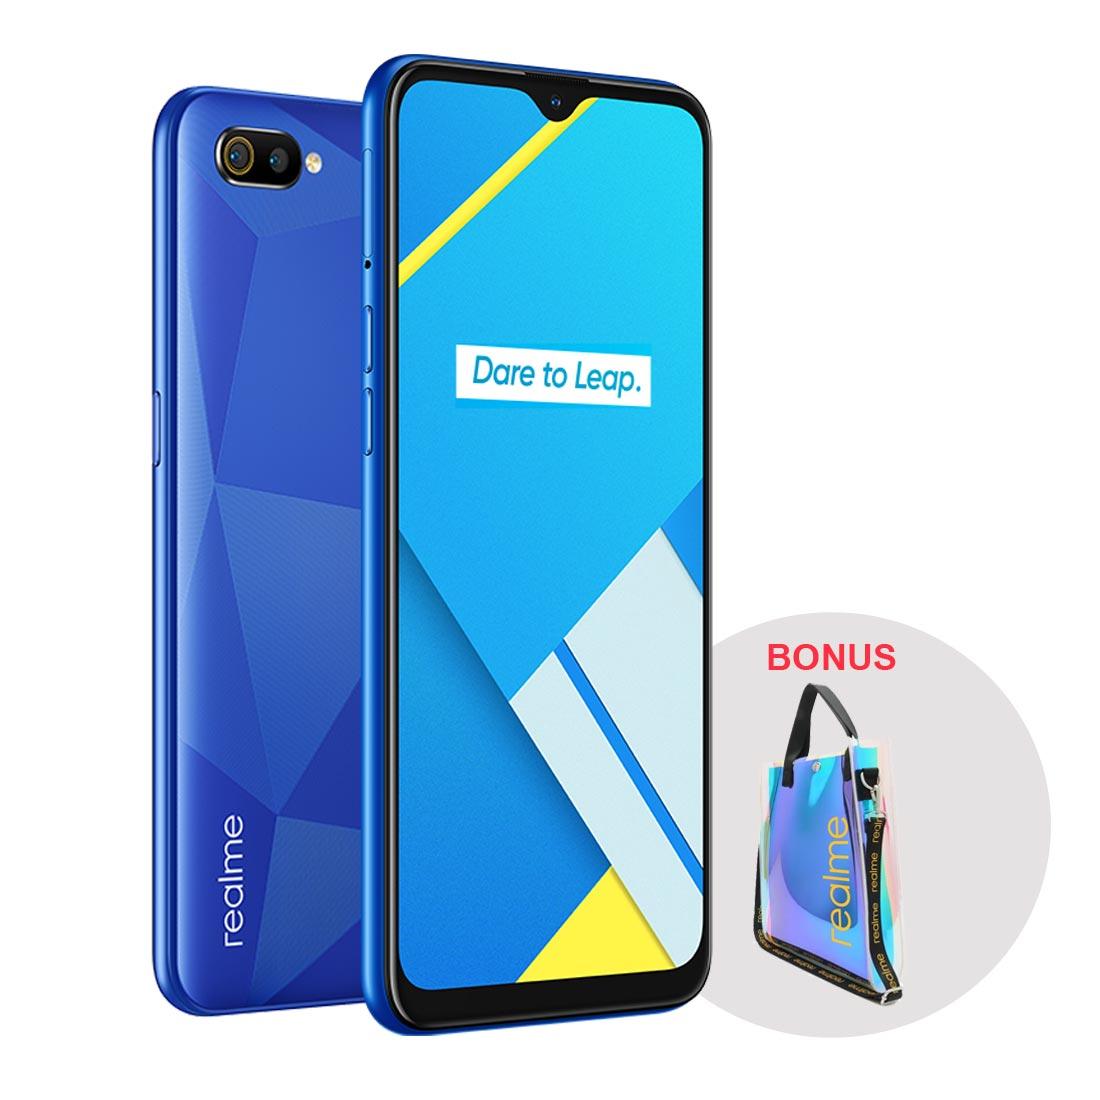 realme C2 (Dual Sim 4G, Bonus Tote Bag) -Â Diamond Blue